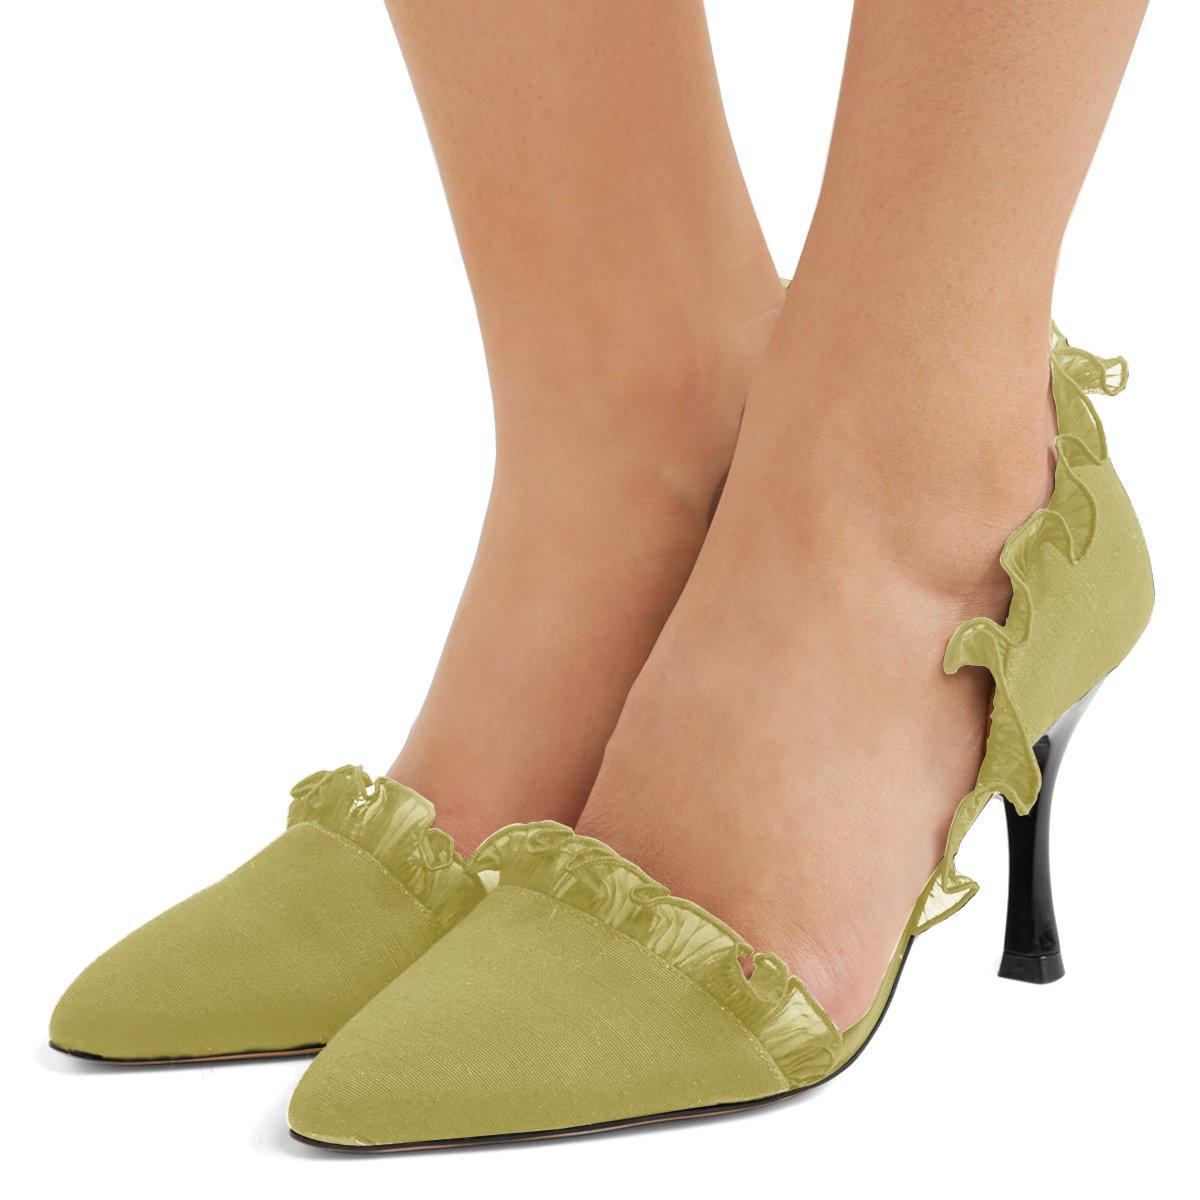 XYD Women Lace D'Orsay Pumps Pointed Toe Stiletto High Heels Slip on Dress Wedding Bridal Shoes B07BHGQXL3 6 B(M) US|Yellow Green